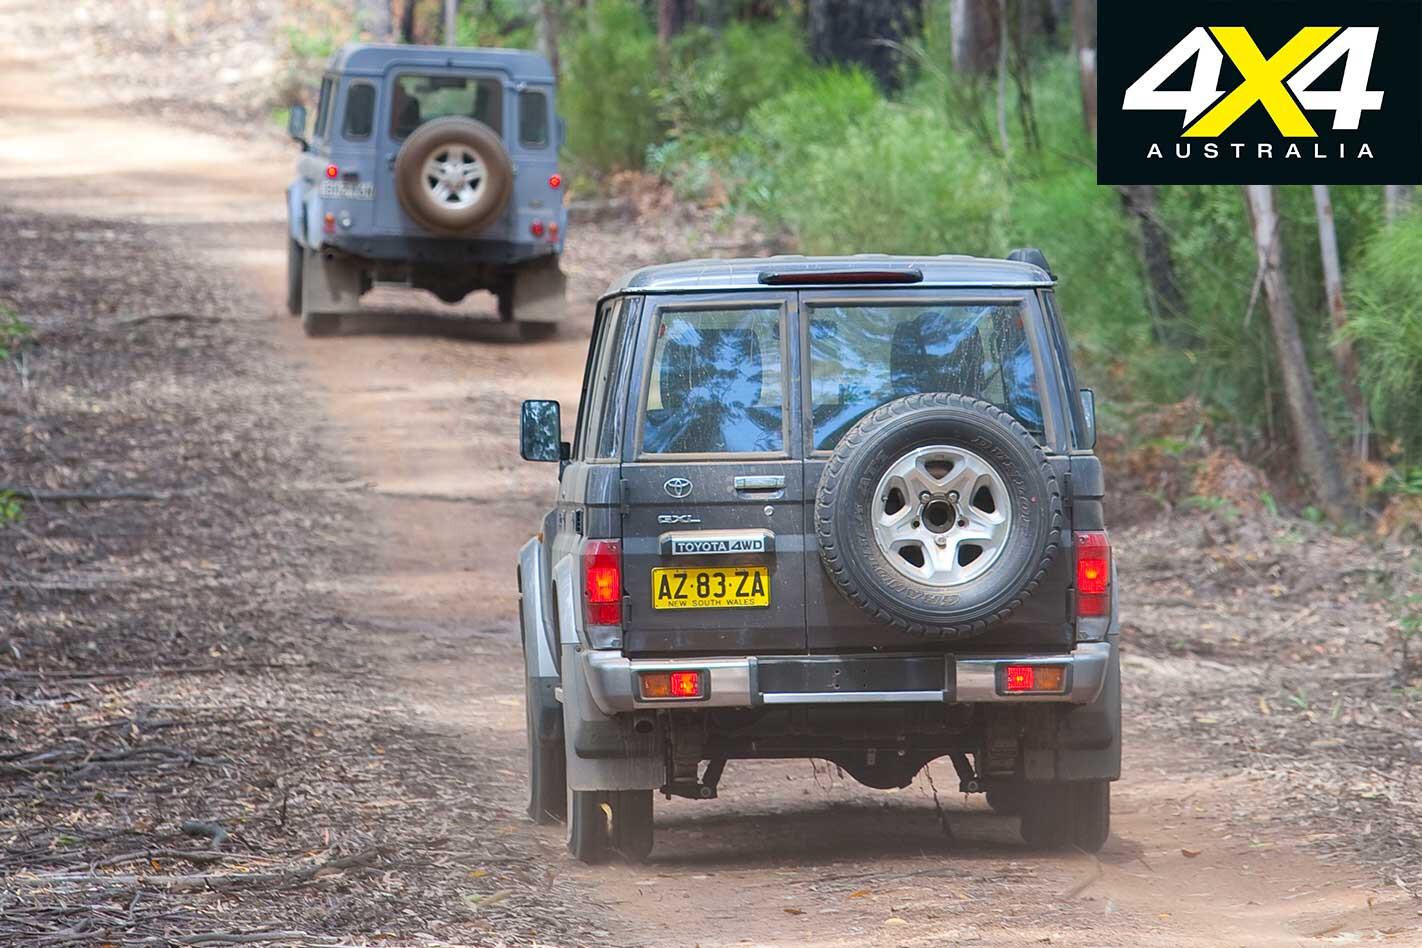 2009 Land Rover Defender Toyota Land Cruiser 76 Series Rear Jpg